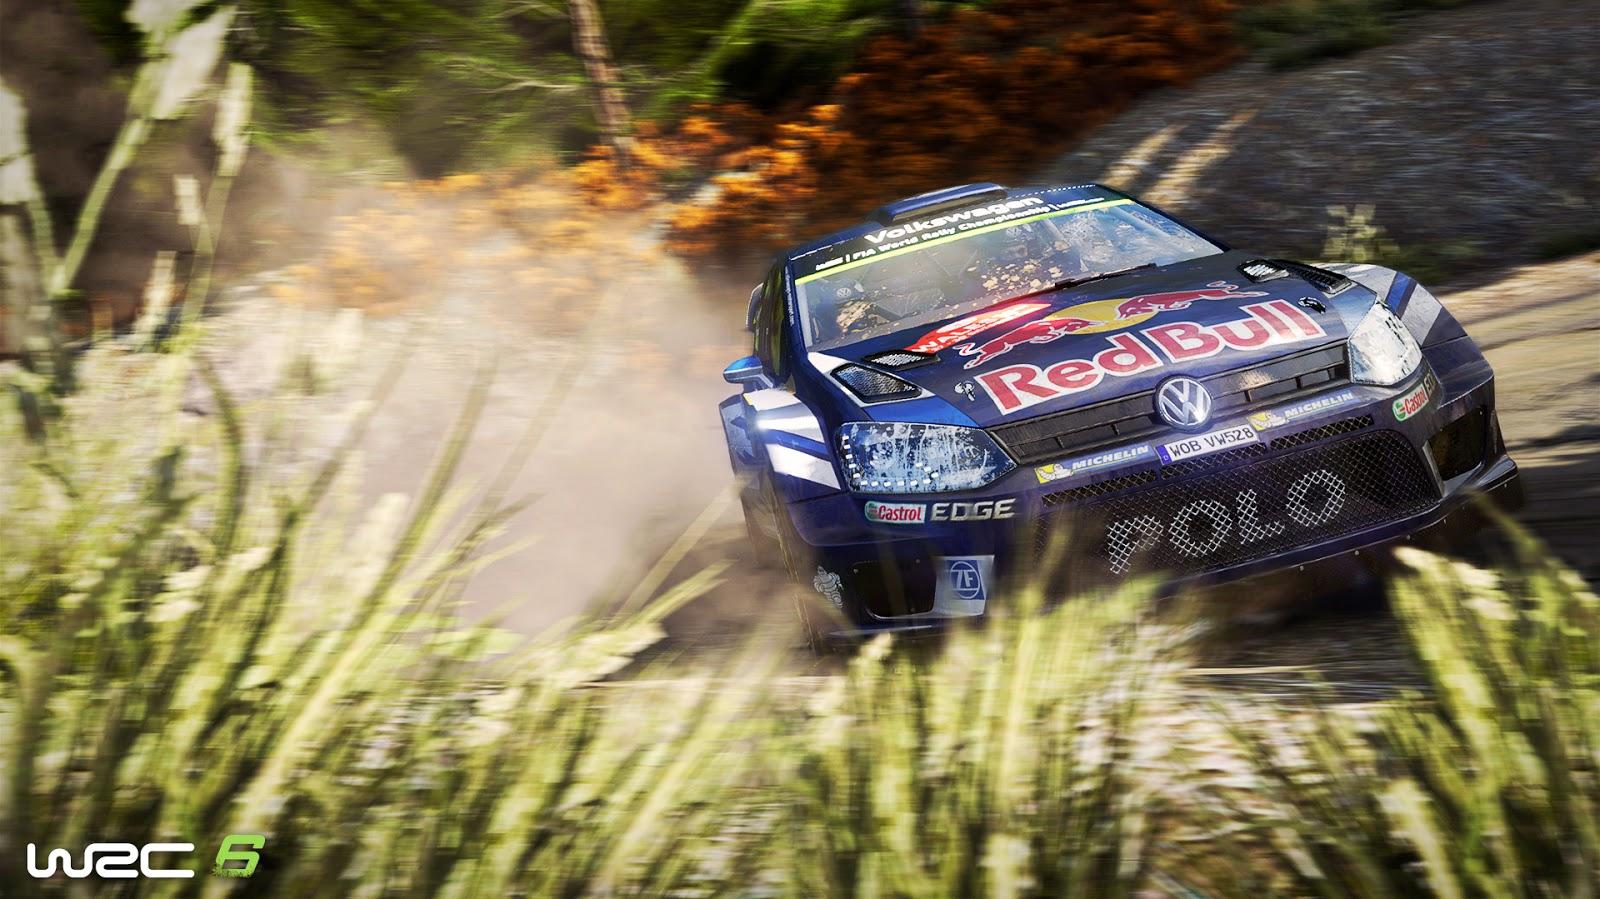 WRC 6 FIA World Rally Championship ESPAÑOL PC (STEAMPUNKS) + REPACK 4 DVD5 (JPW) 8